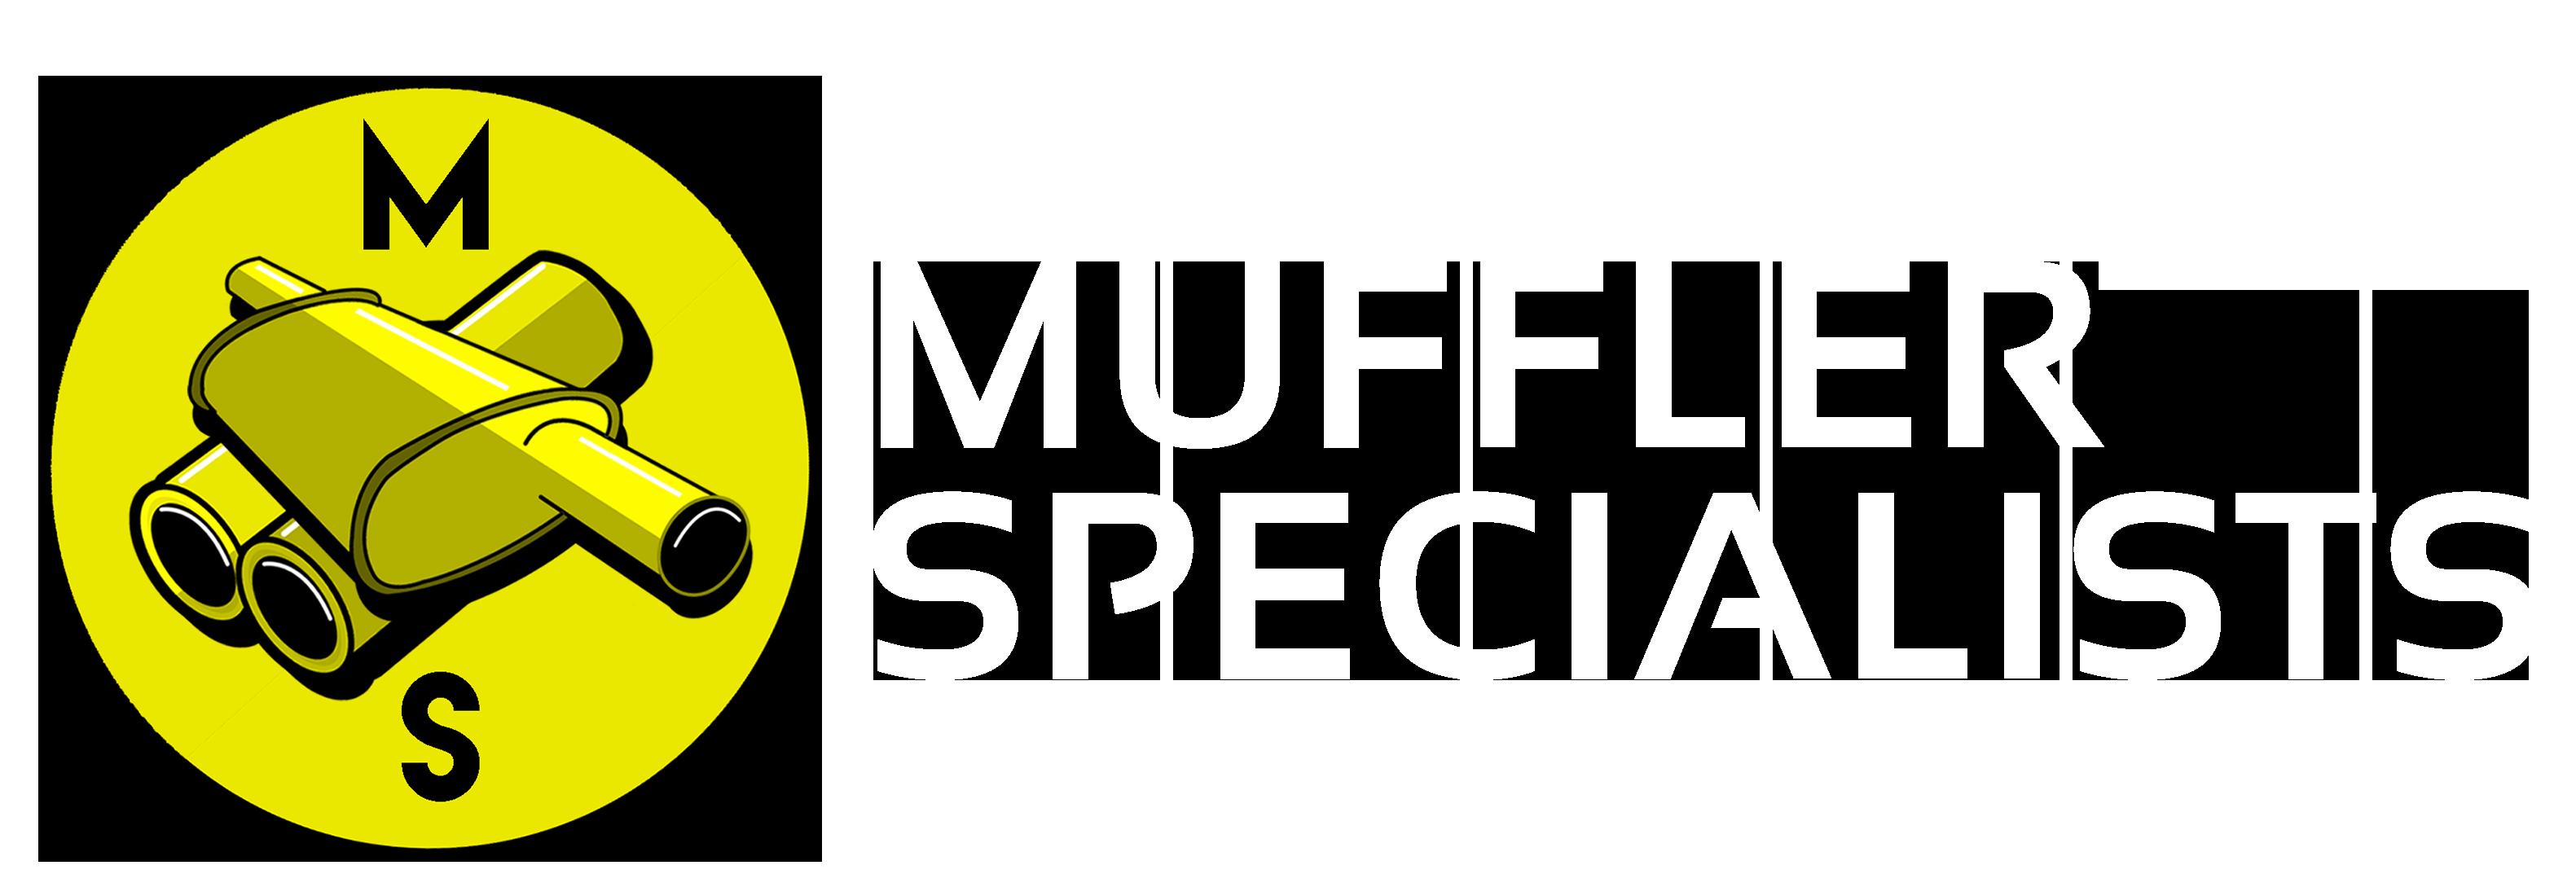 Muffler Specialists